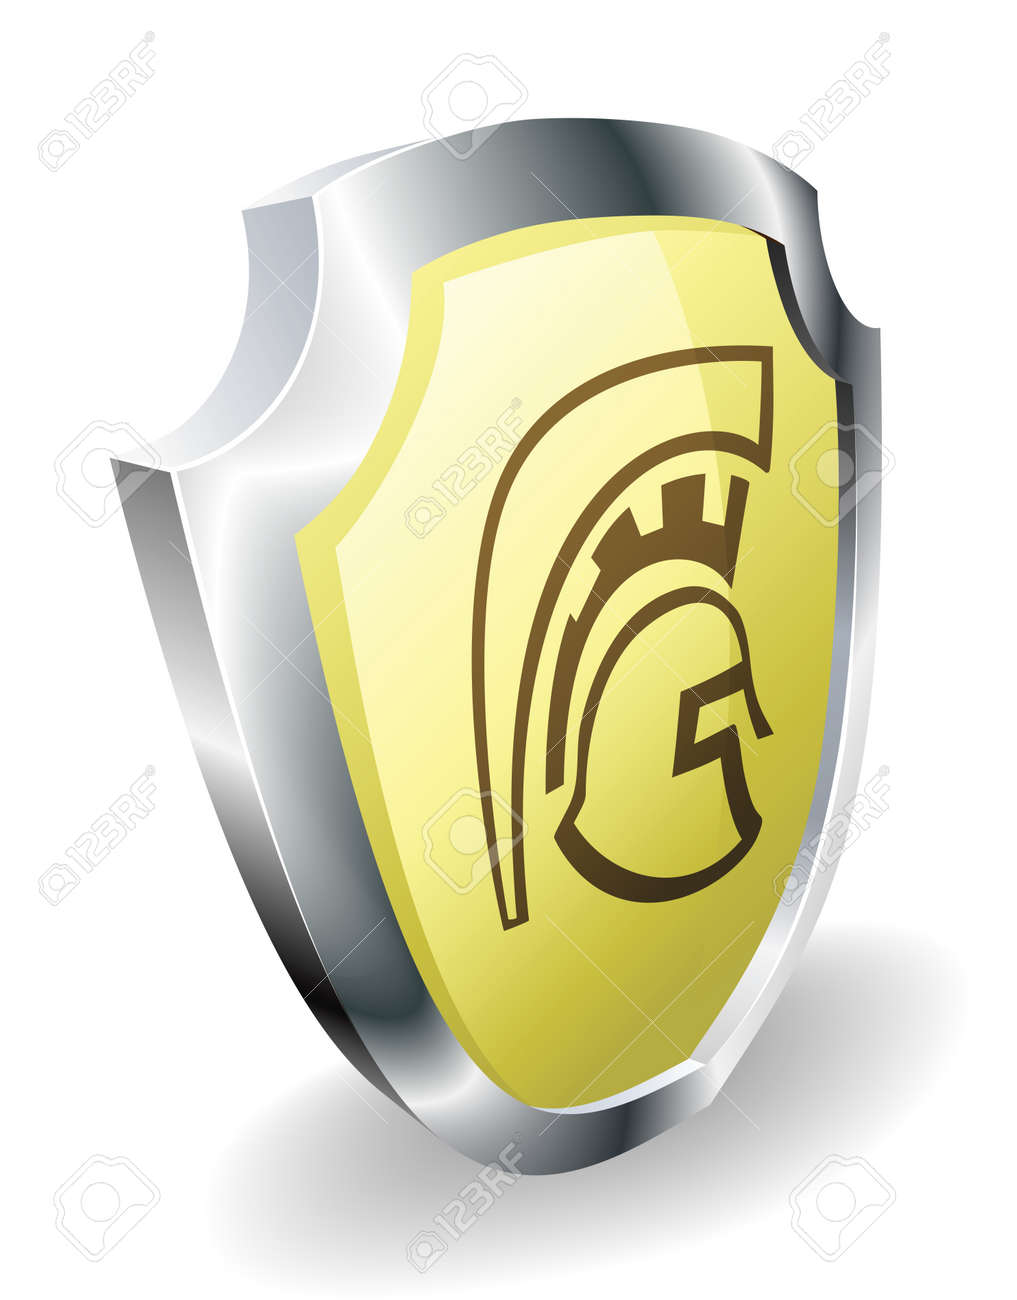 A Spartan, Trojan, or Roman shield security concept. Shield with helmet icon. Stock Vector - 10908702